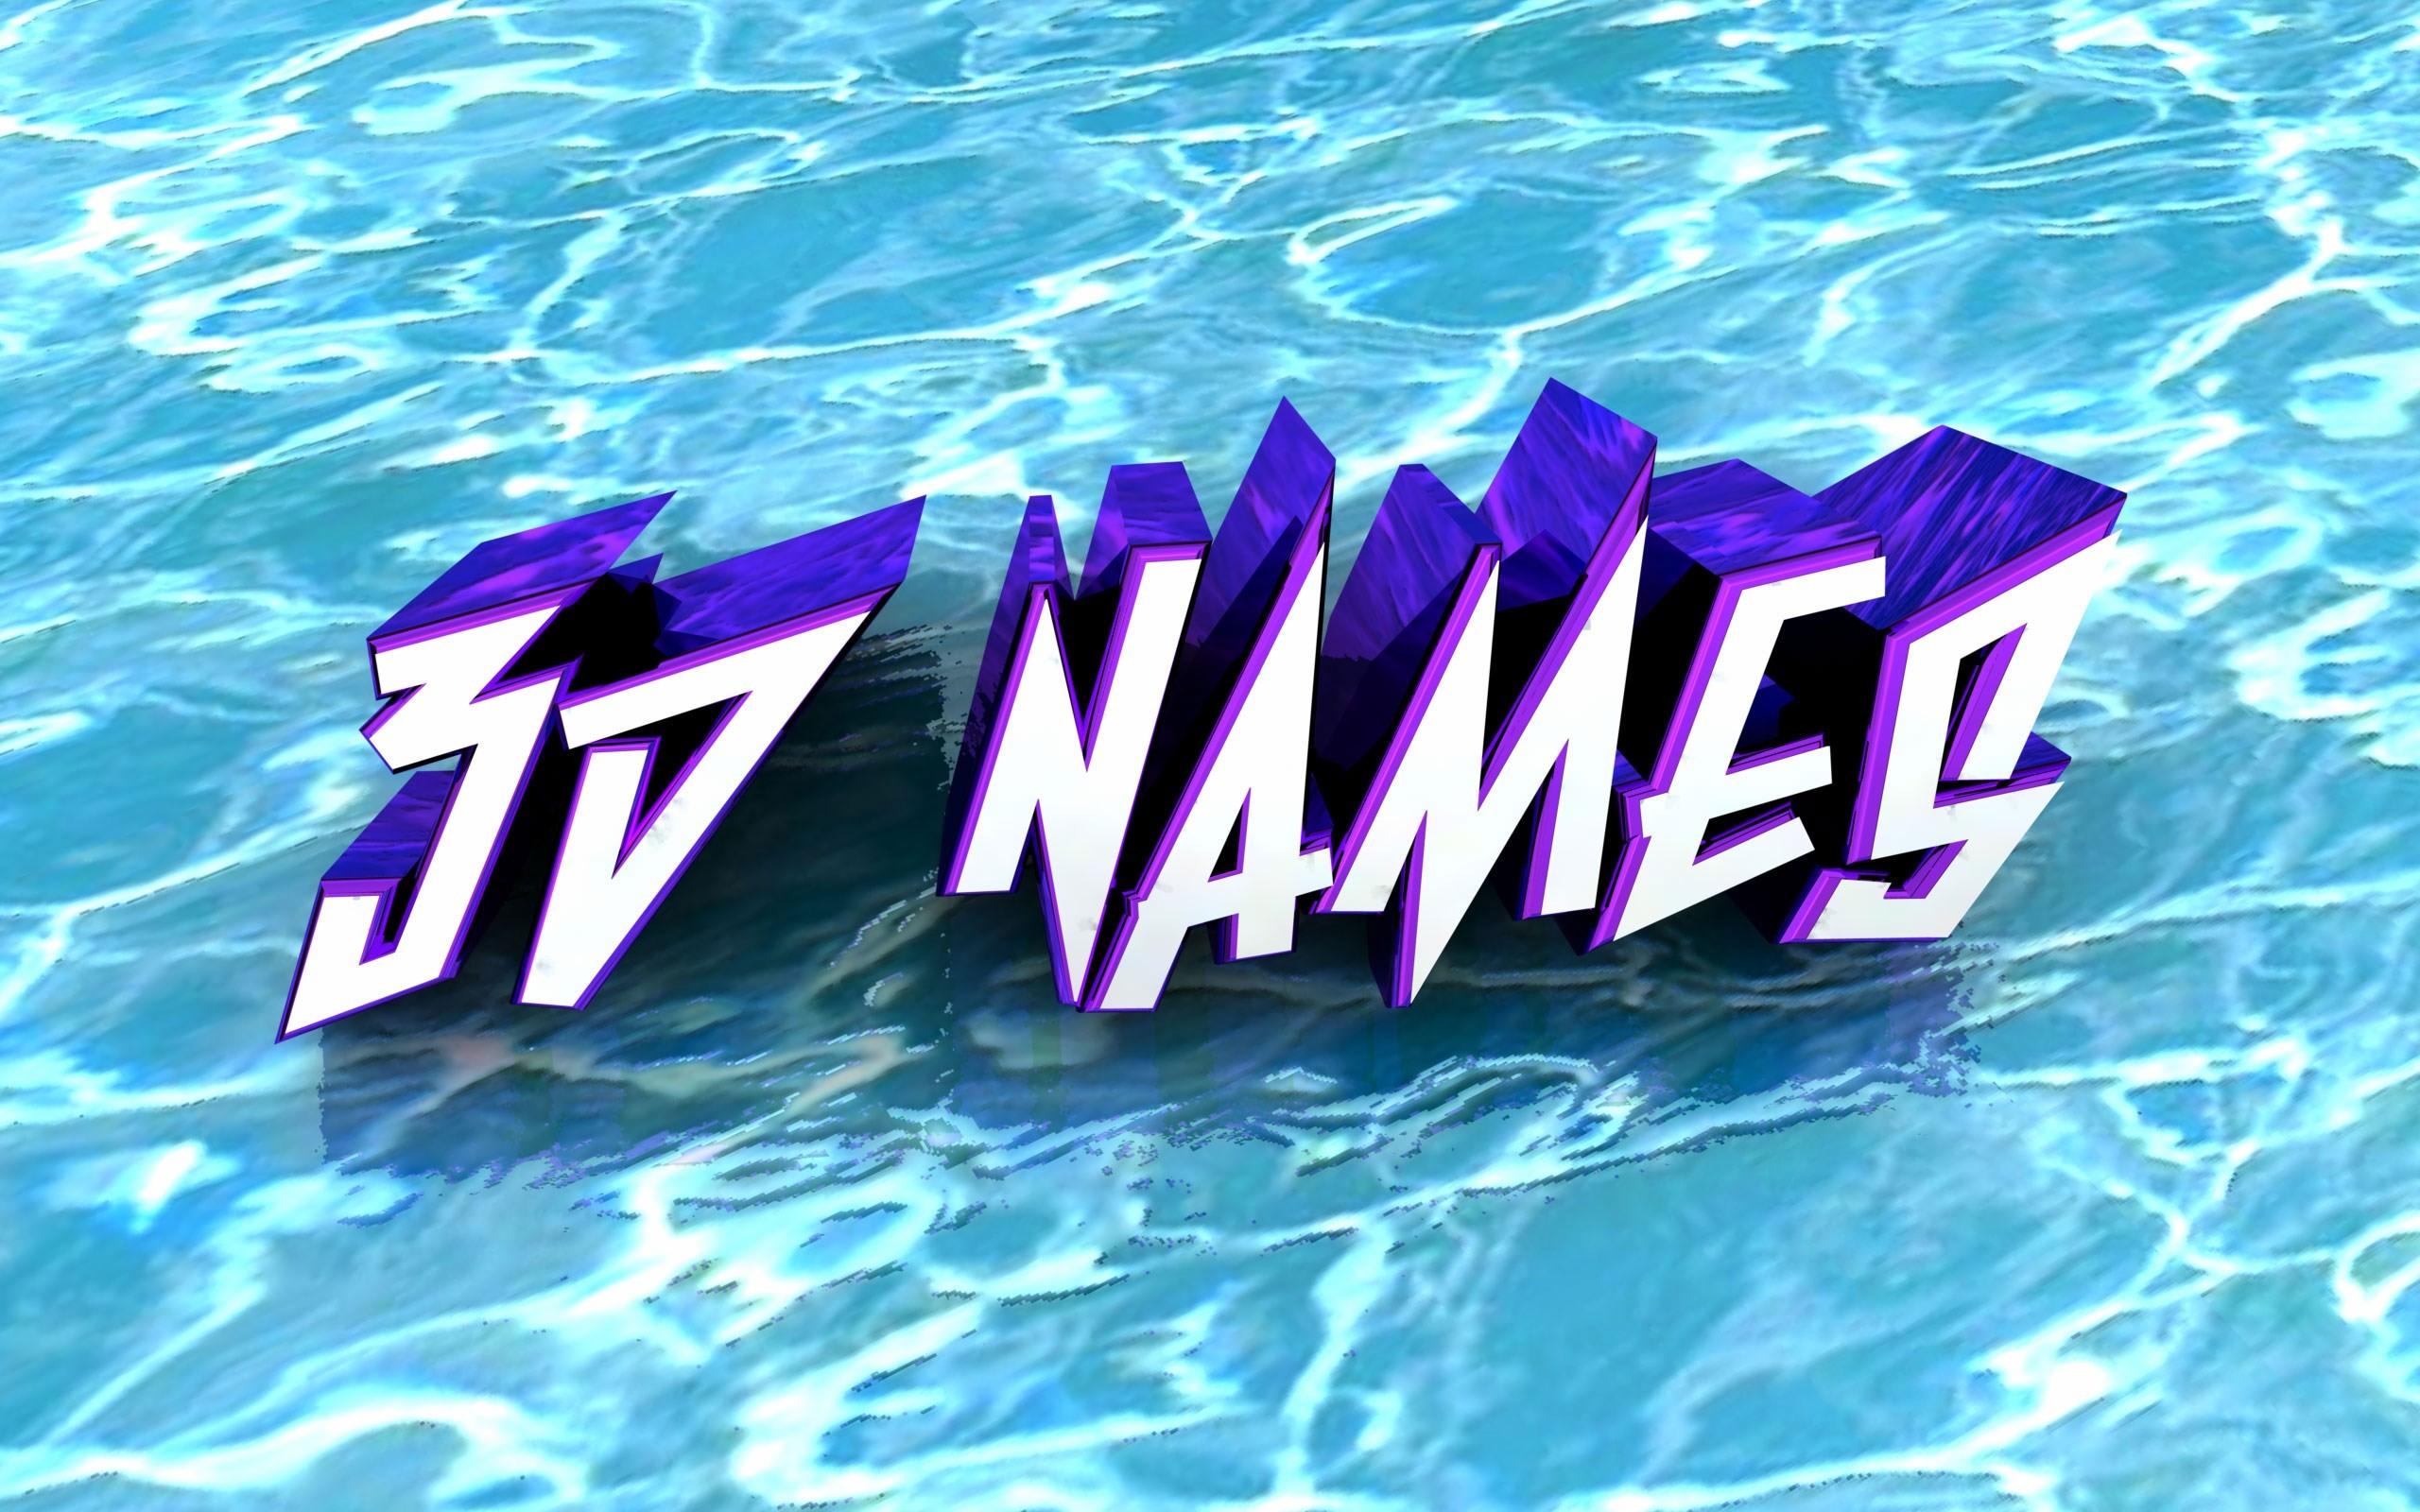 3D Name Wallpaper 2560x1600